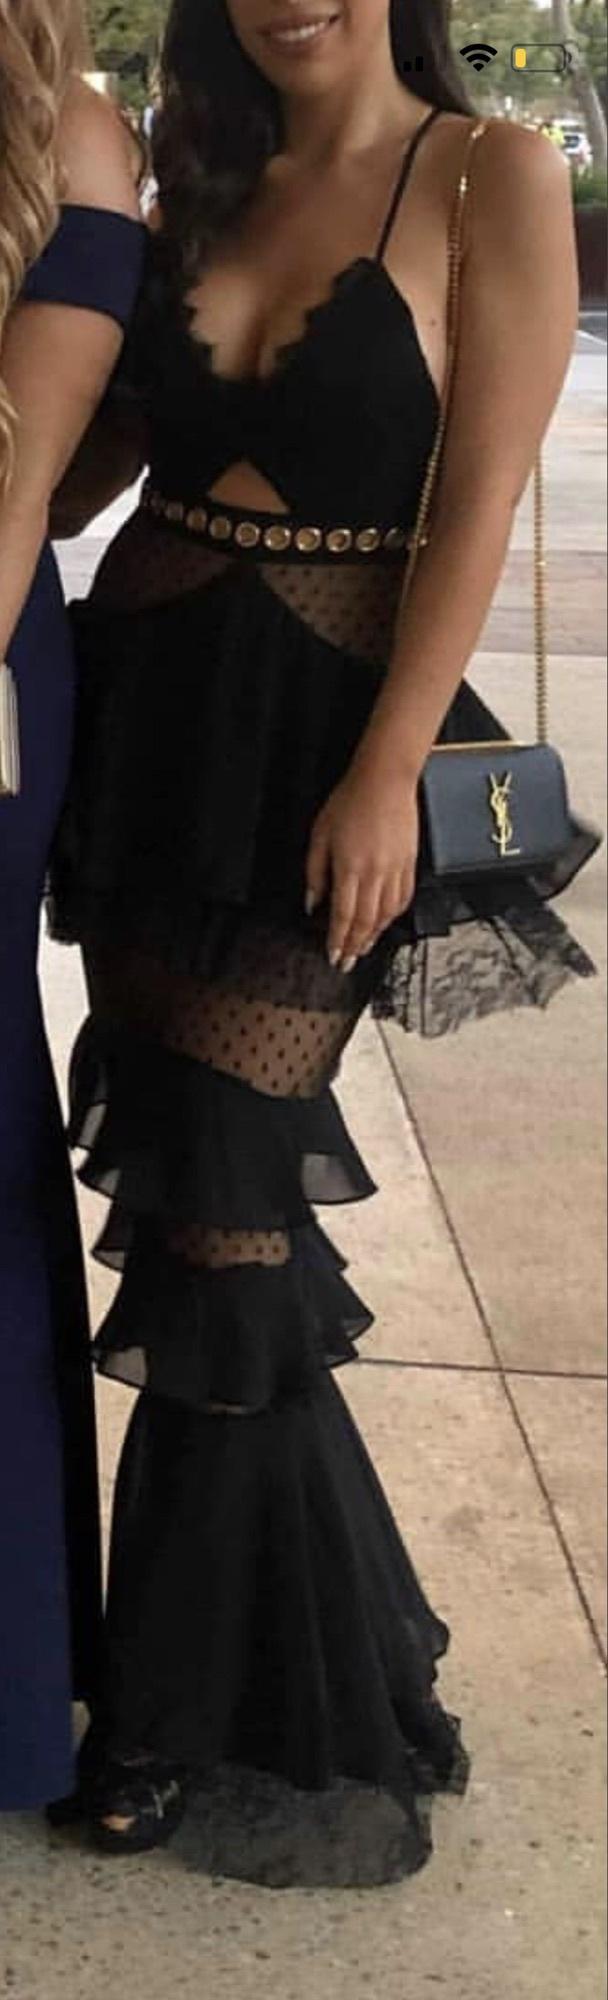 dress black dress formal formal wear ball ball gown dress long dress fishnet detail fish tale dress black dress with frills elegant dress lace elegant dress formal wear  black long dress